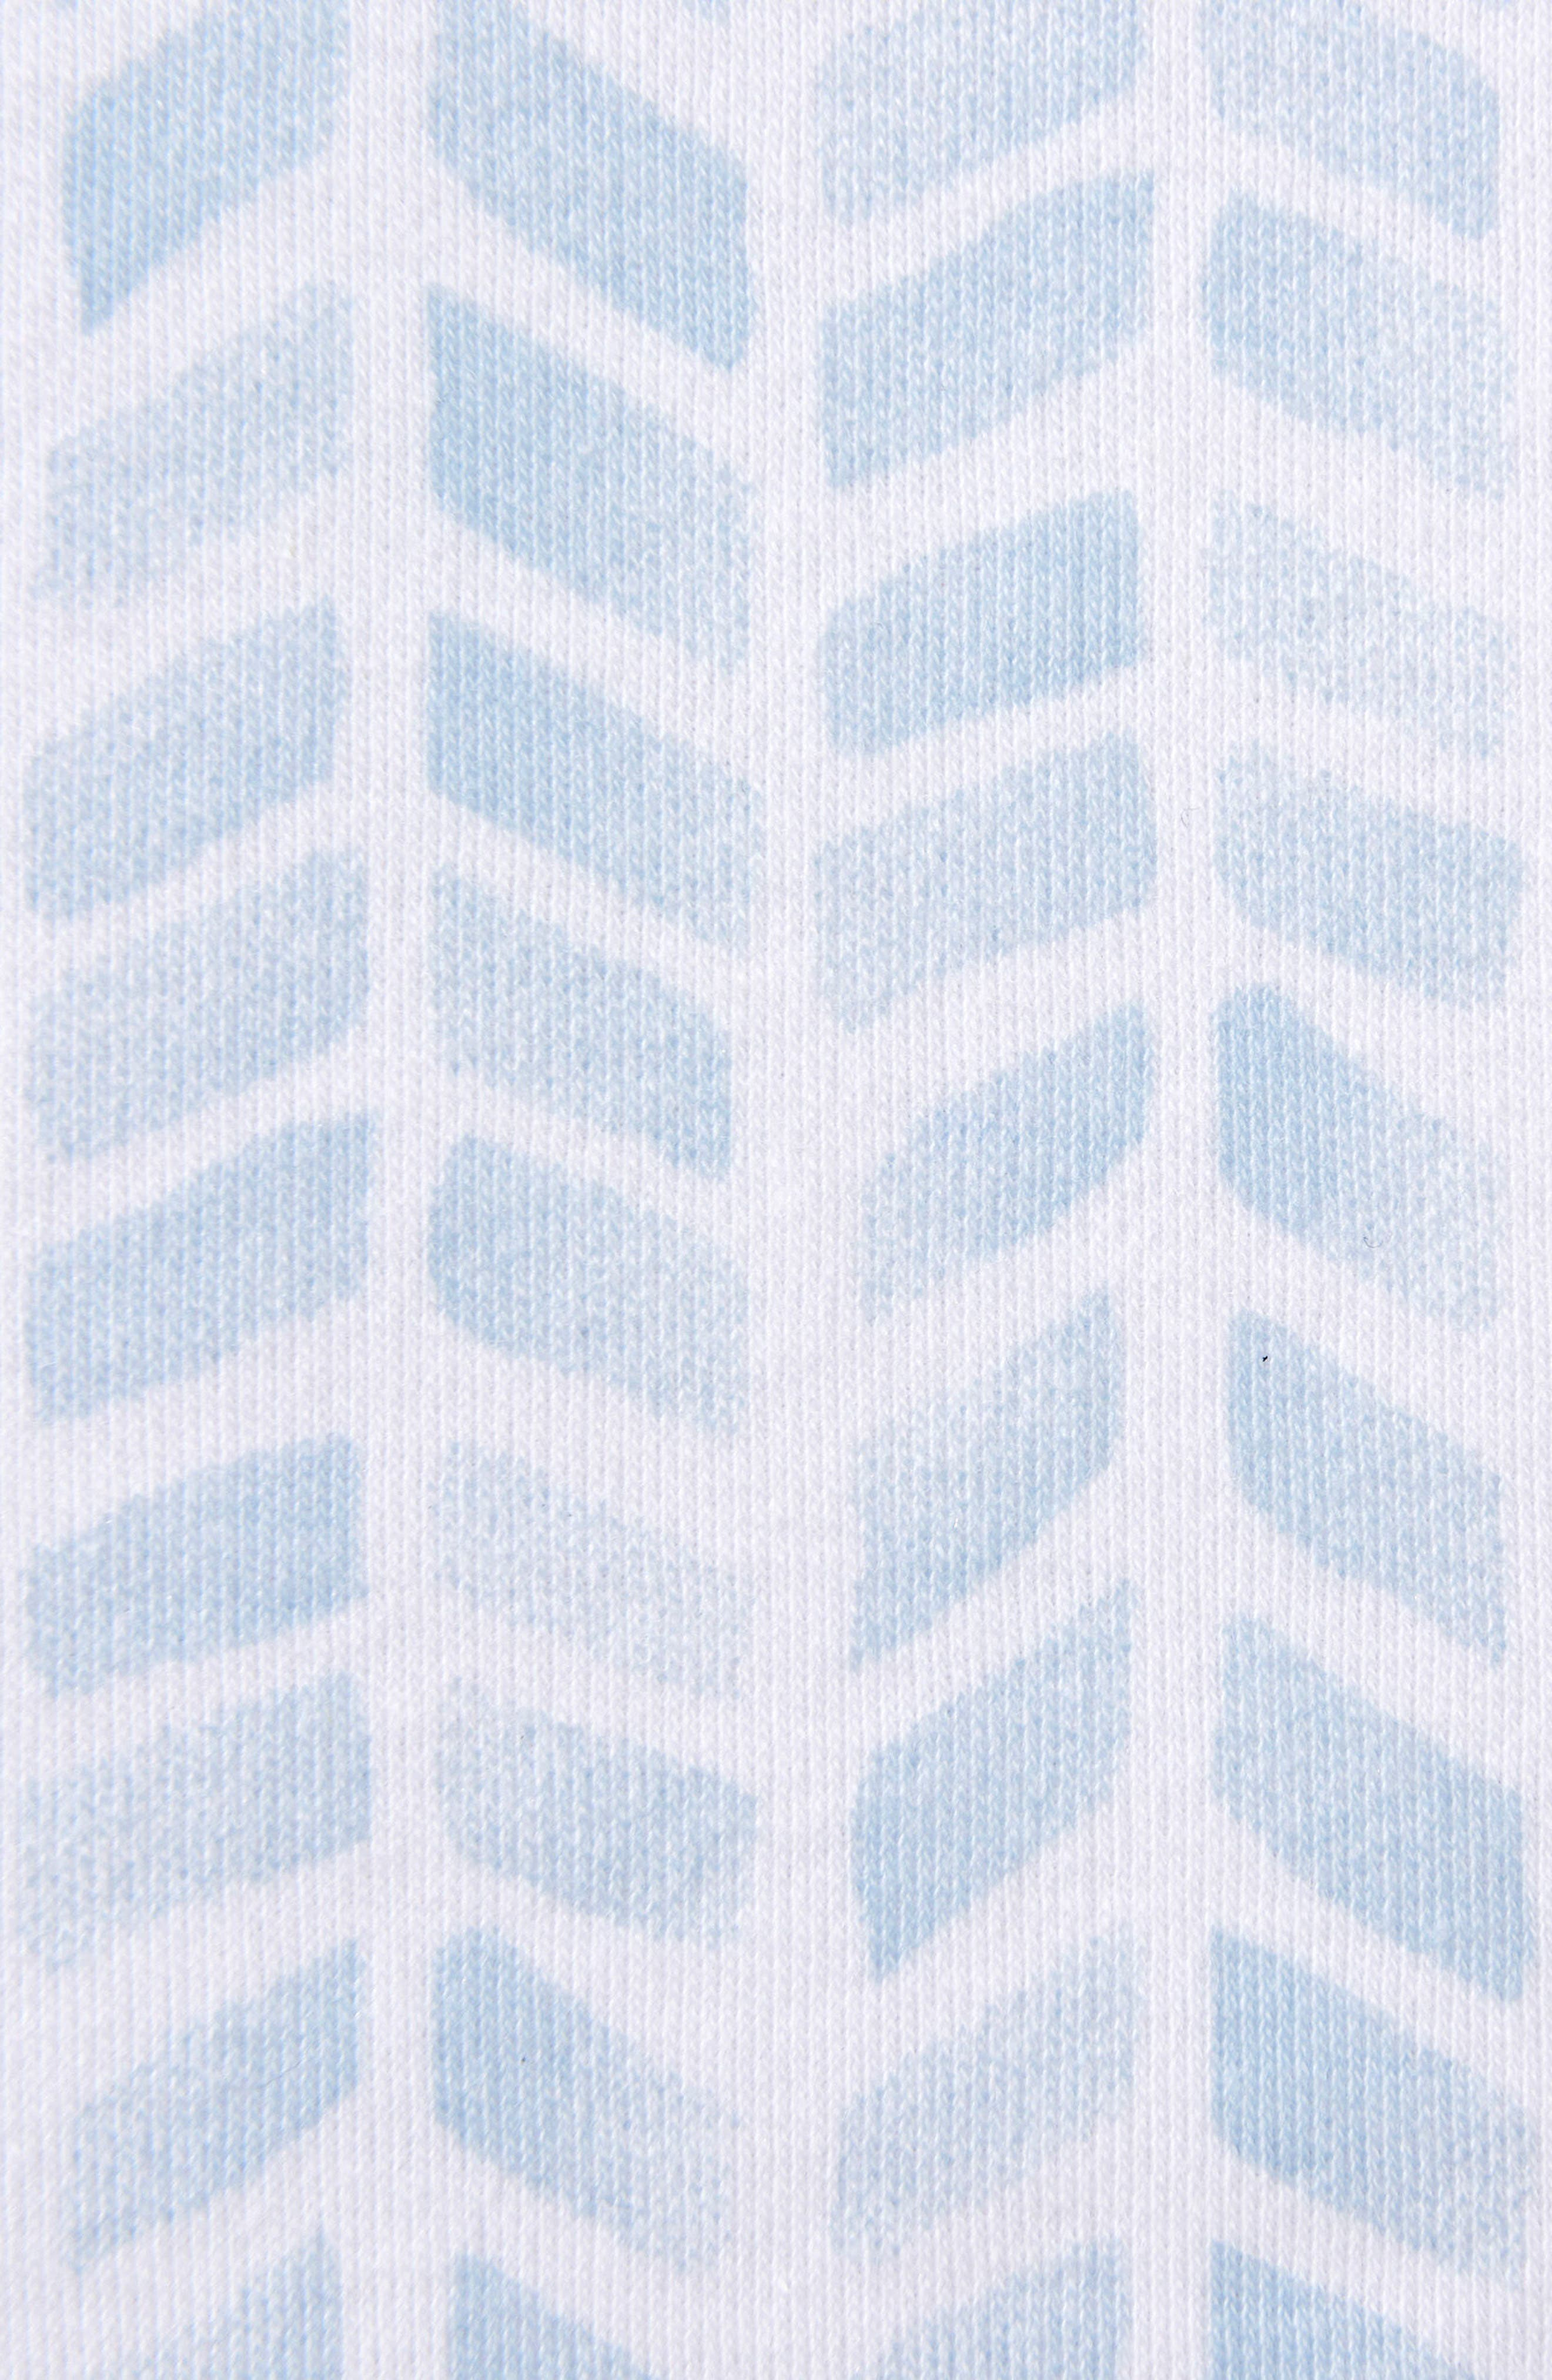 HALO<sup>®</sup> Innovations Platinum Series SleepSack<sup>™</sup>,                             Alternate thumbnail 4, color,                             Pale Blue Chevron